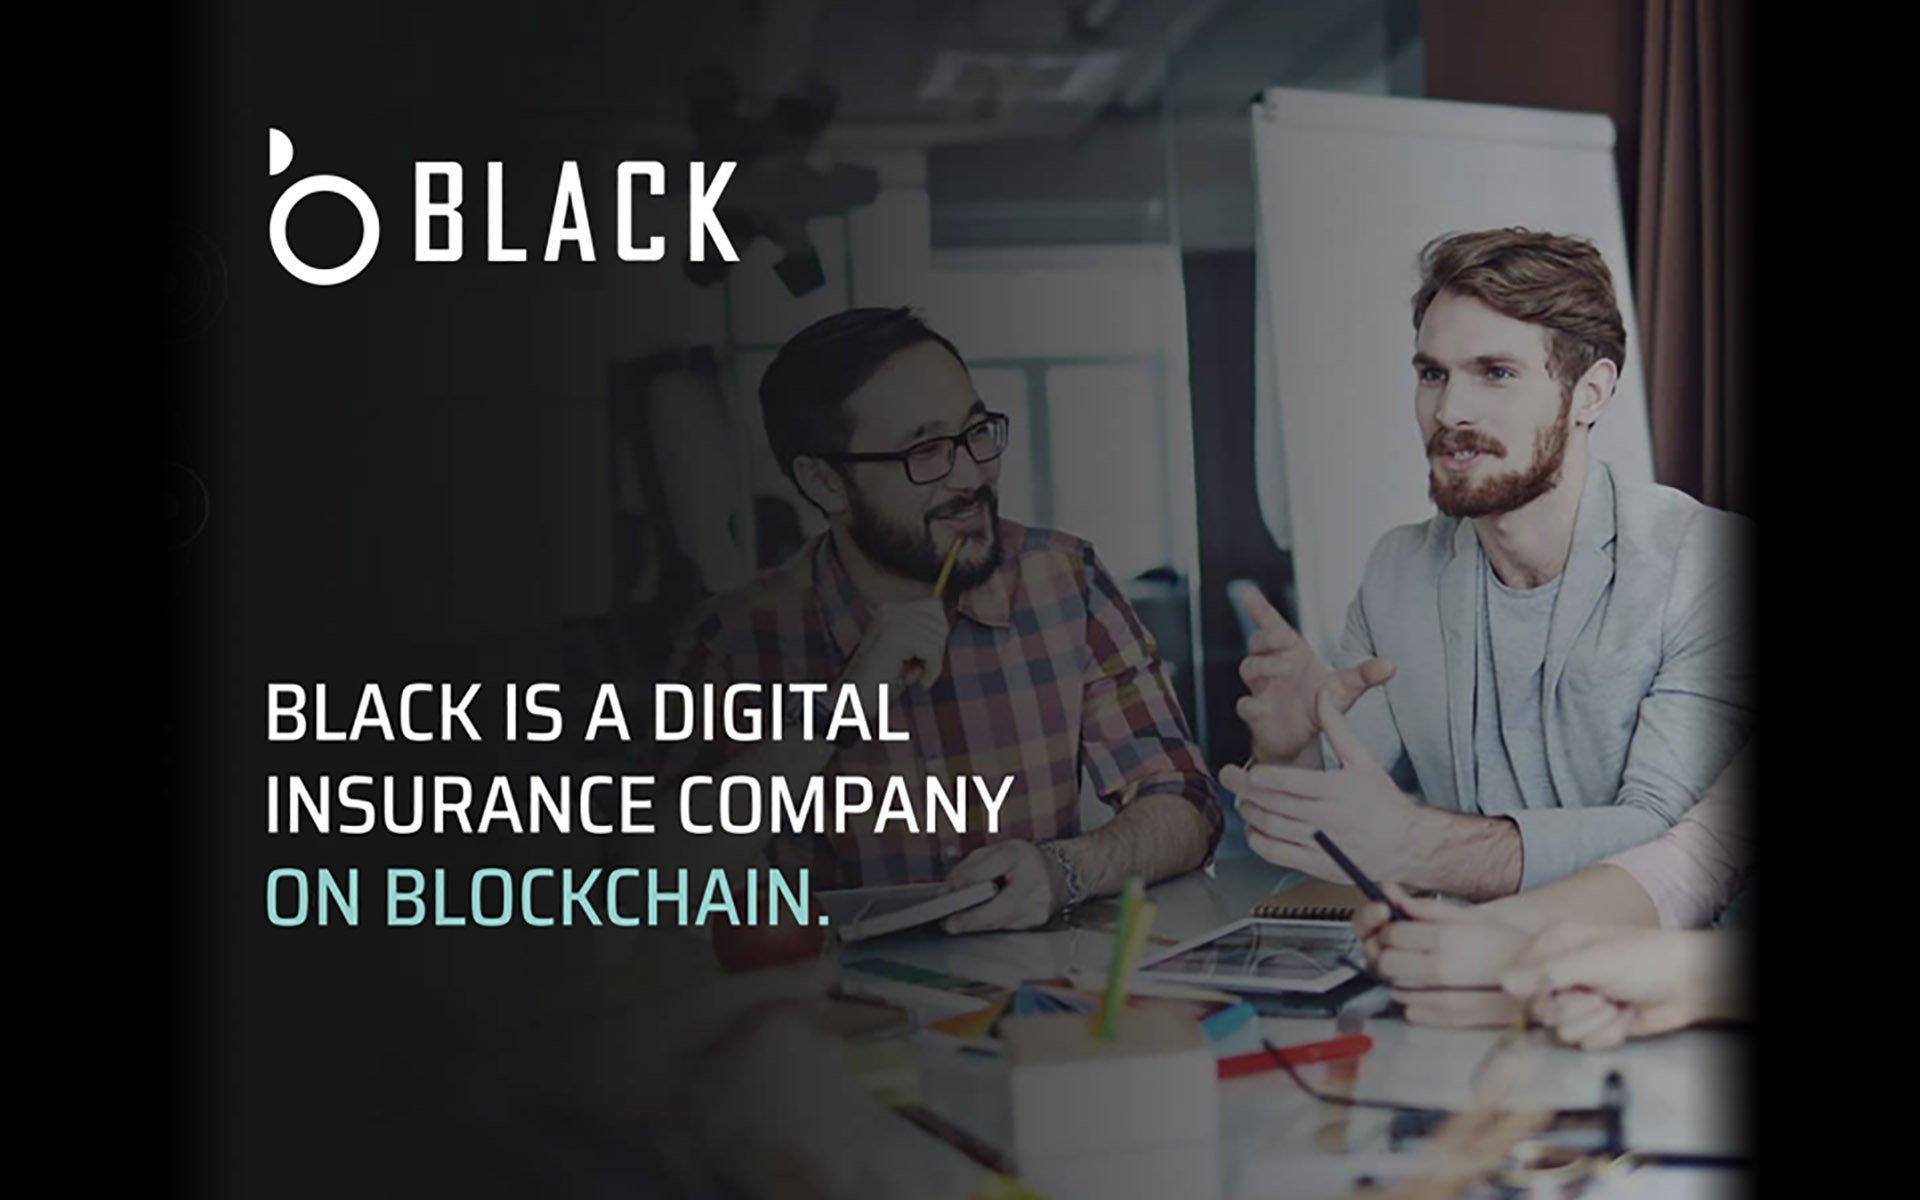 Digital Insurance Provider on Blockchain, Black Insurance Ropes in Professor Alex Norta as the Scientific Advisor